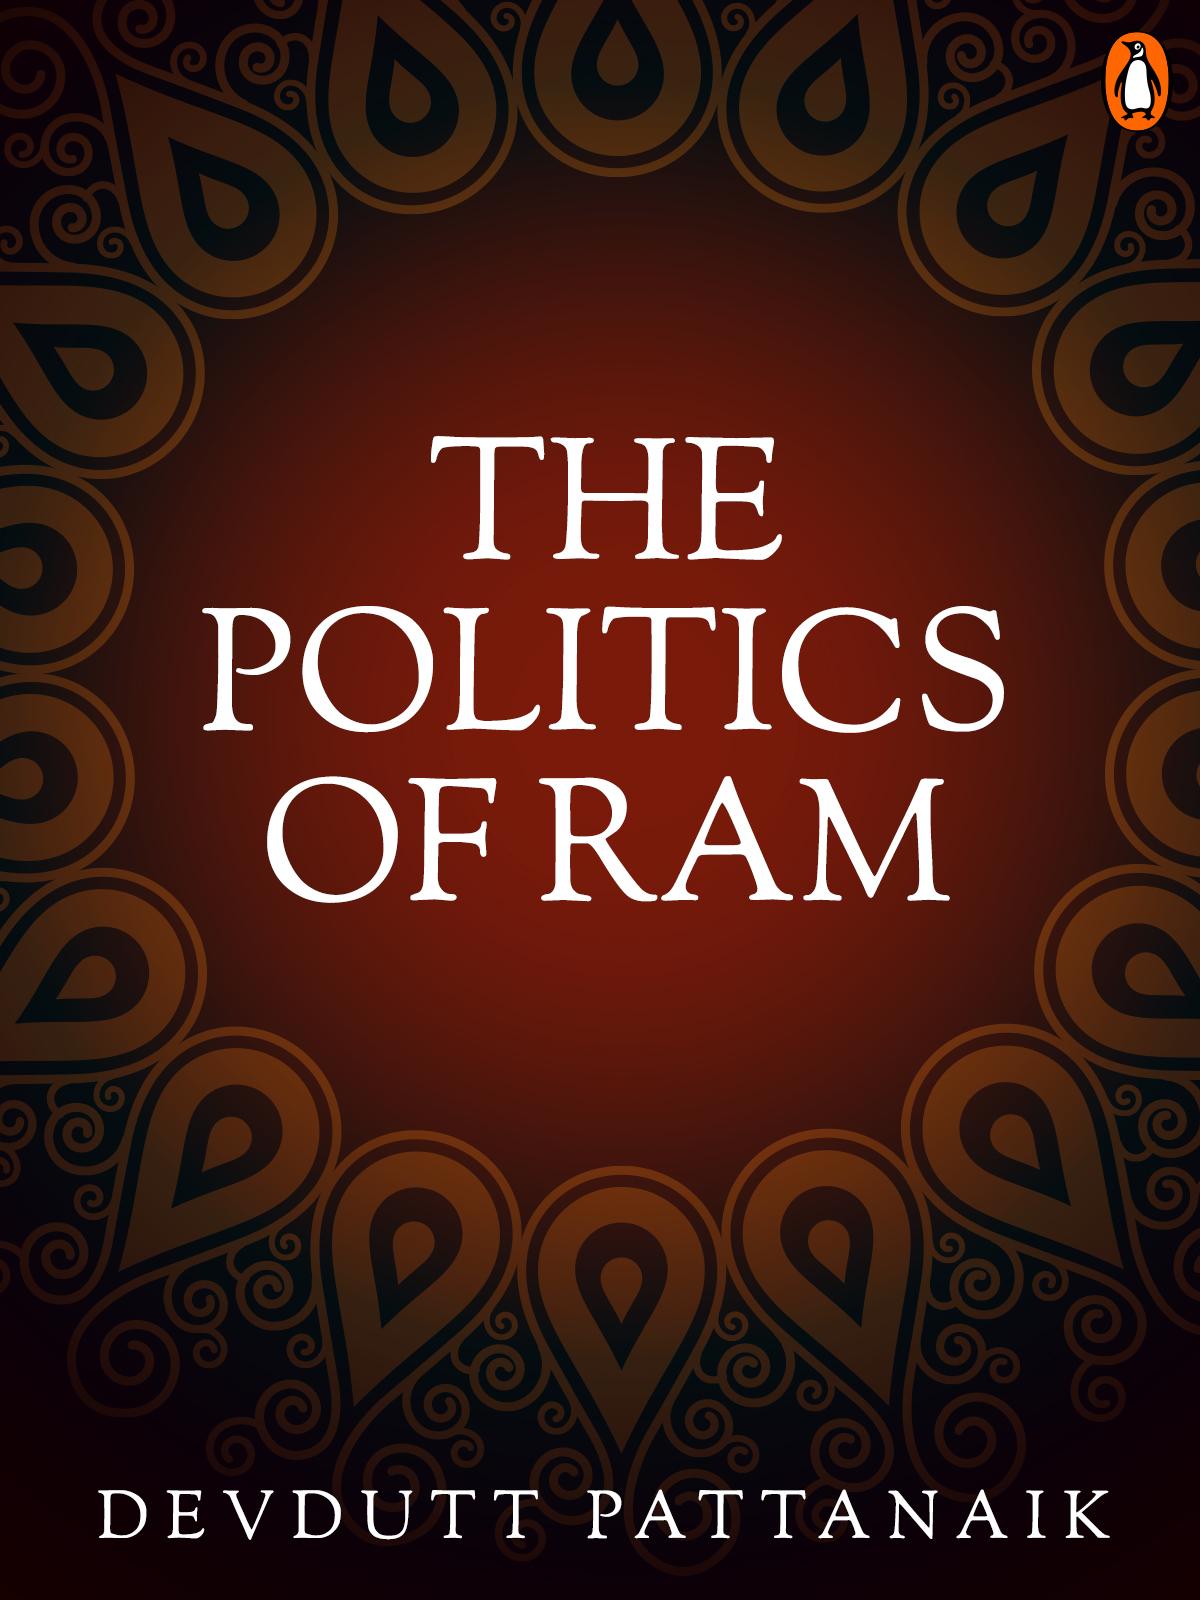 The Politics of Ram